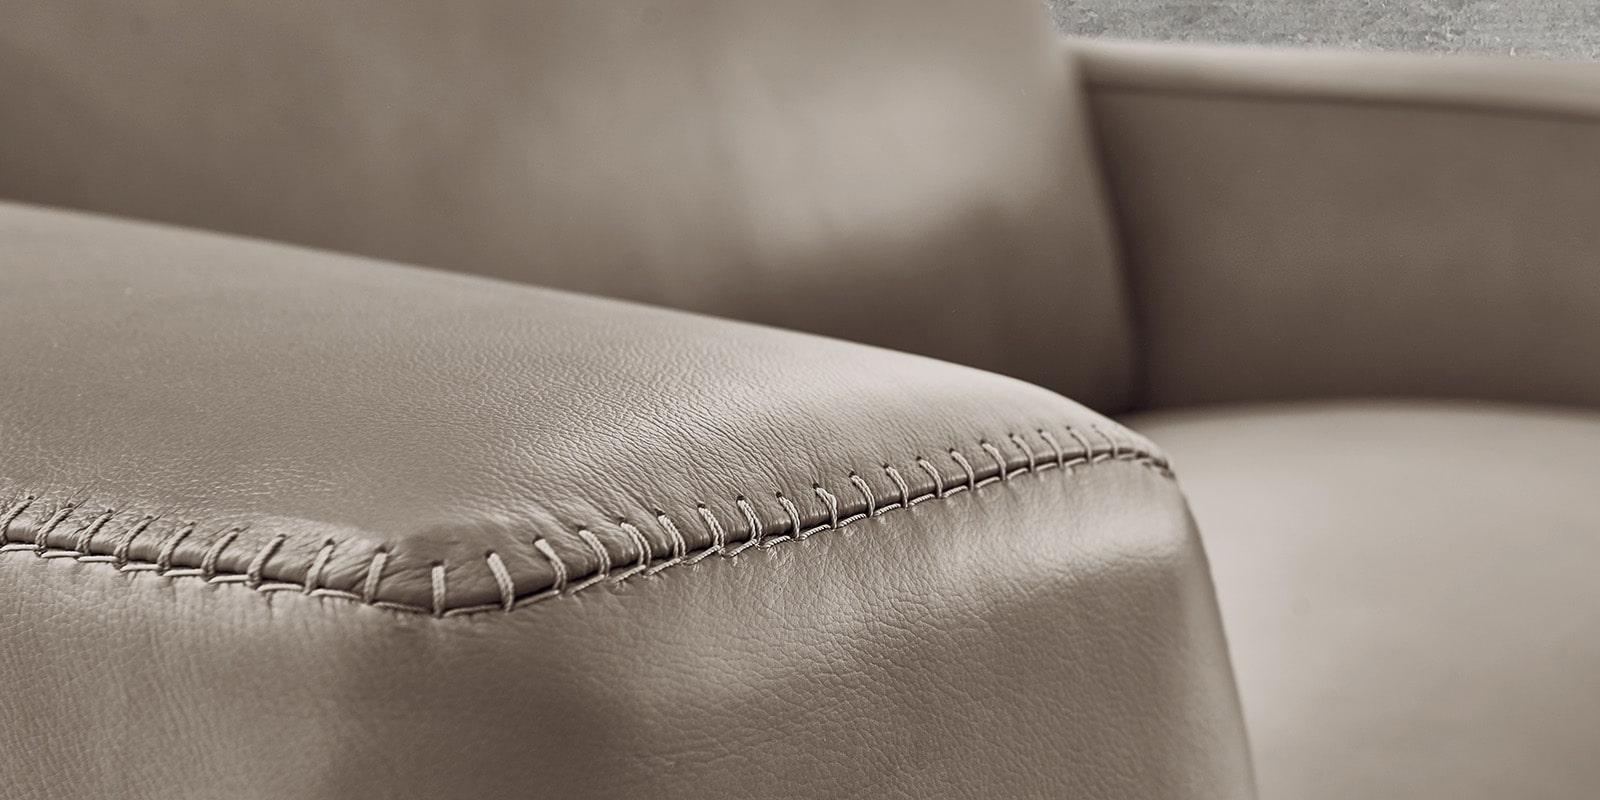 Moebella24 - 1,5-Sitzer - Sessel - Sofa - Barcelona - Leder - Taupe - Skandinavisches - Design - Punto - cavallo - Nähte - Detailaufnahme